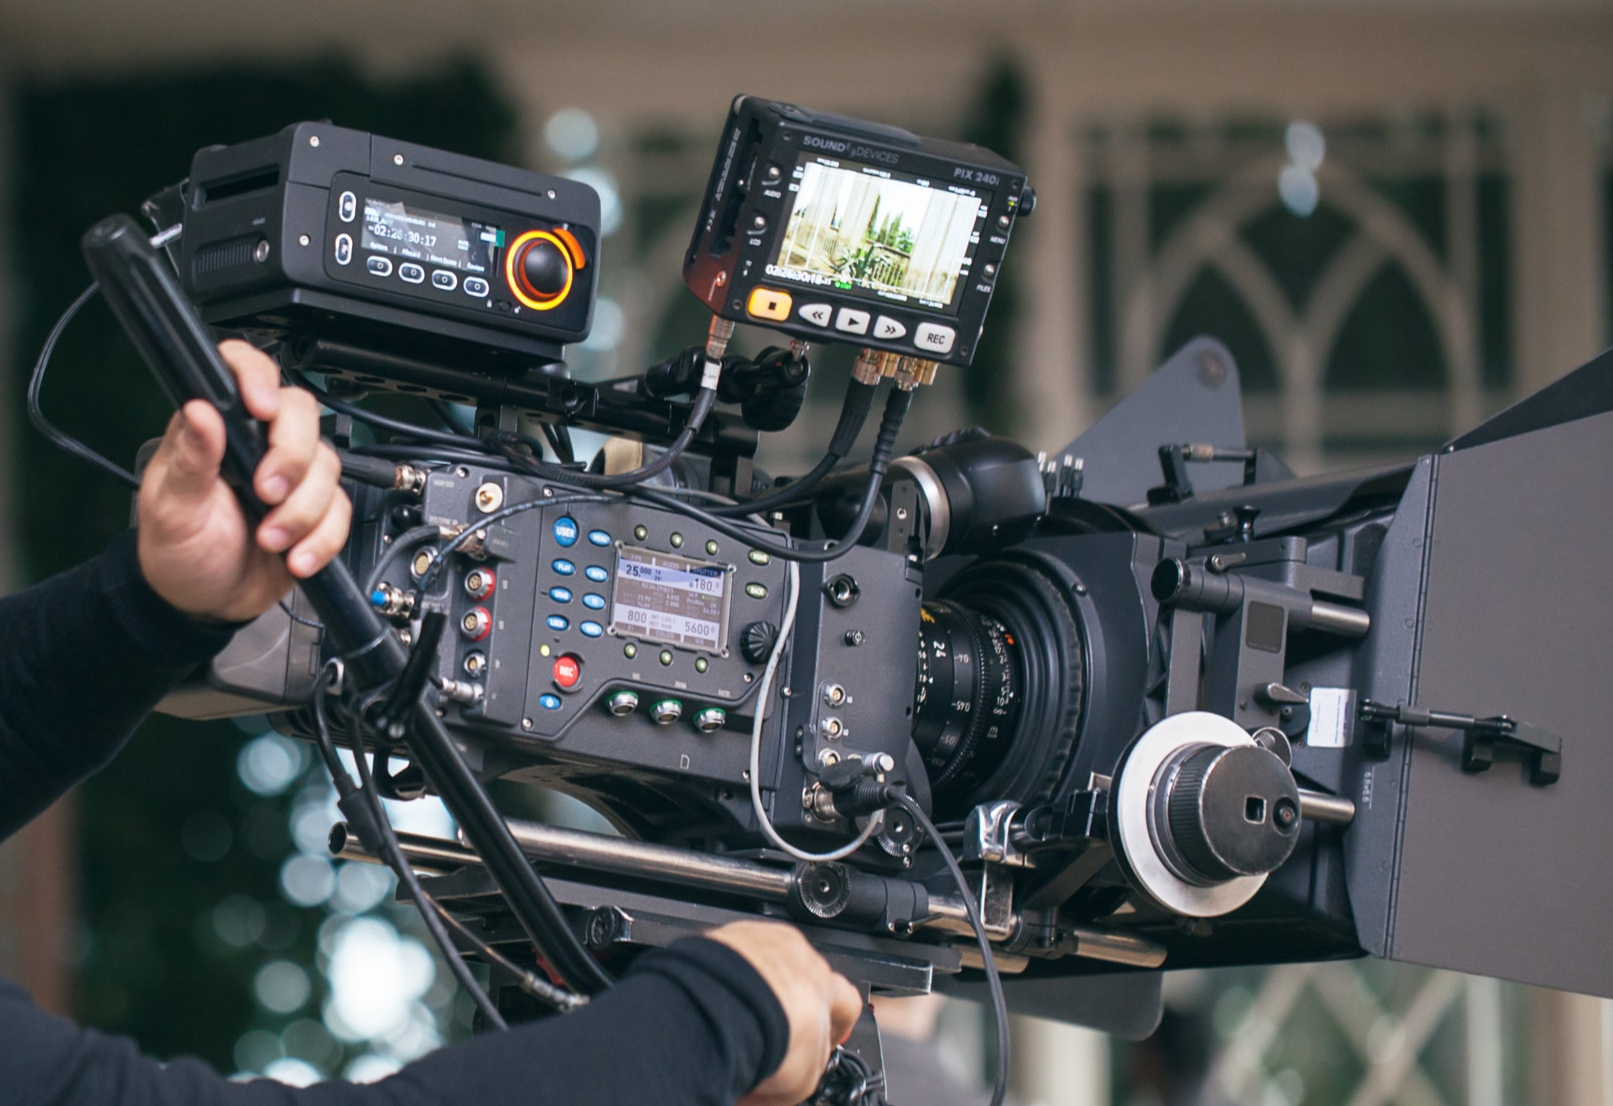 Production - Single & Multiple CameraStudio & On LocationGreen ScreenStill & Time-lapseAerial Platform